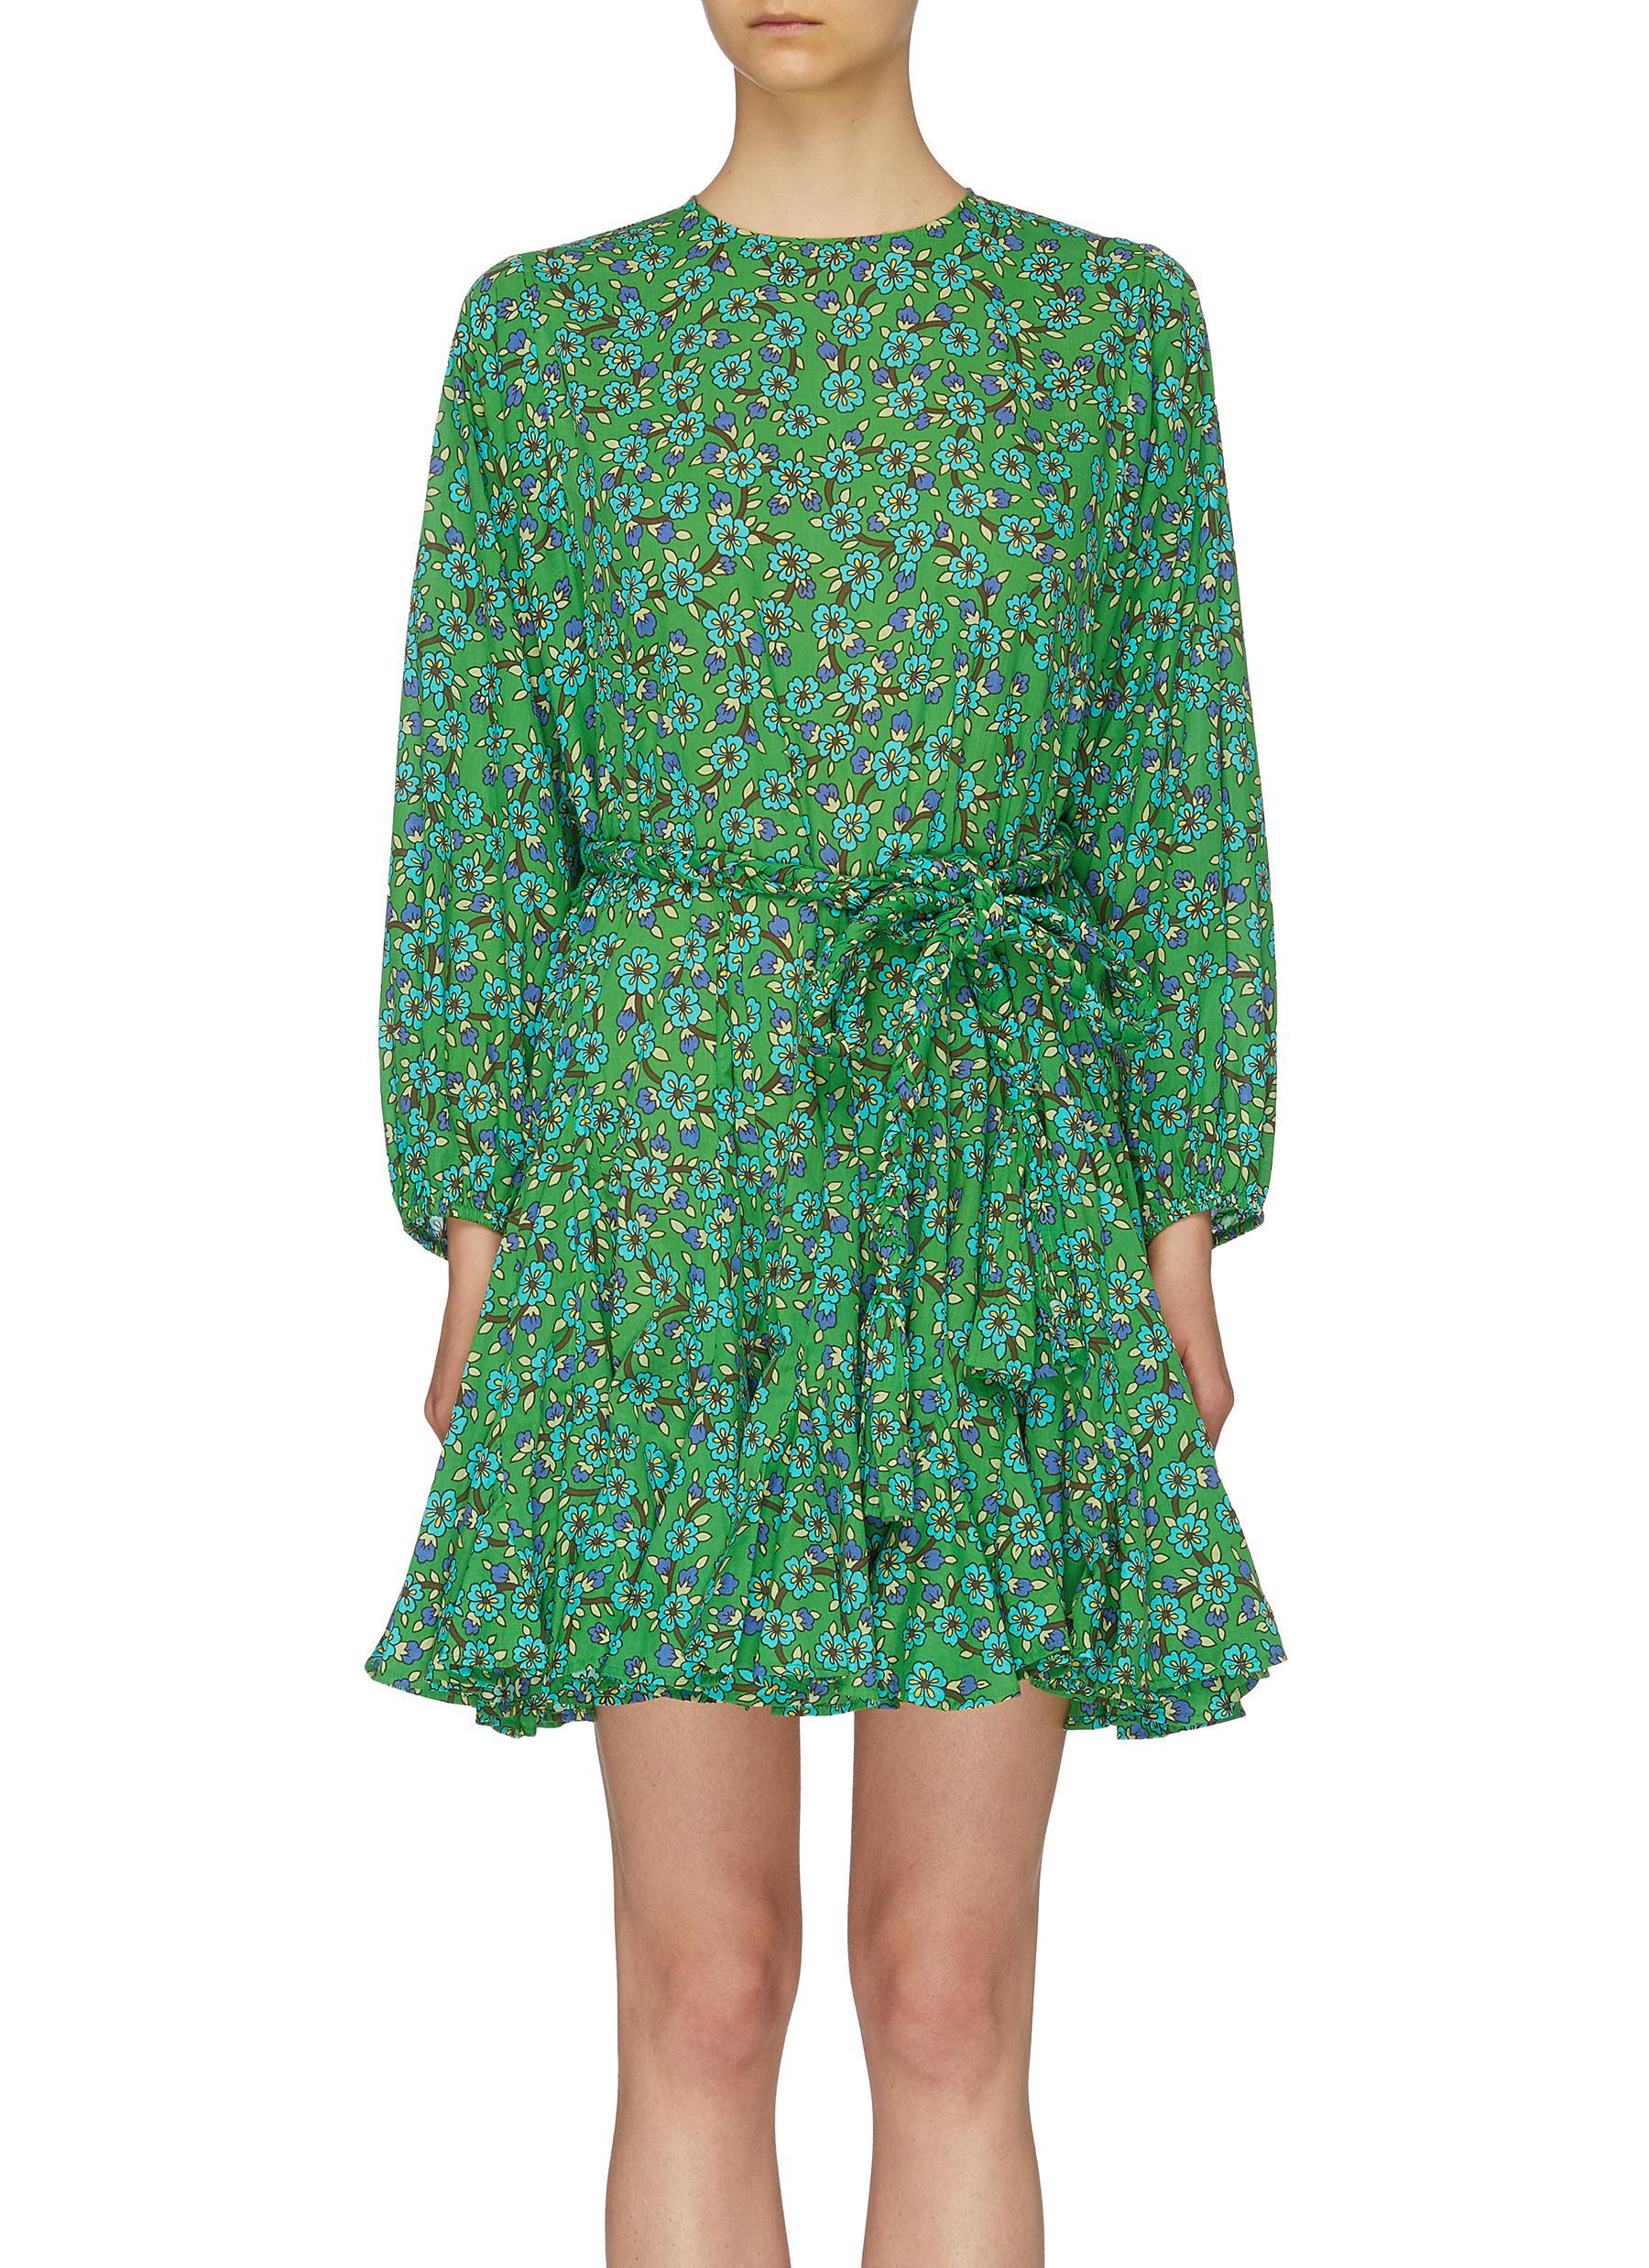 Ella belted flared ditsy floral print dress by Rhode Resort